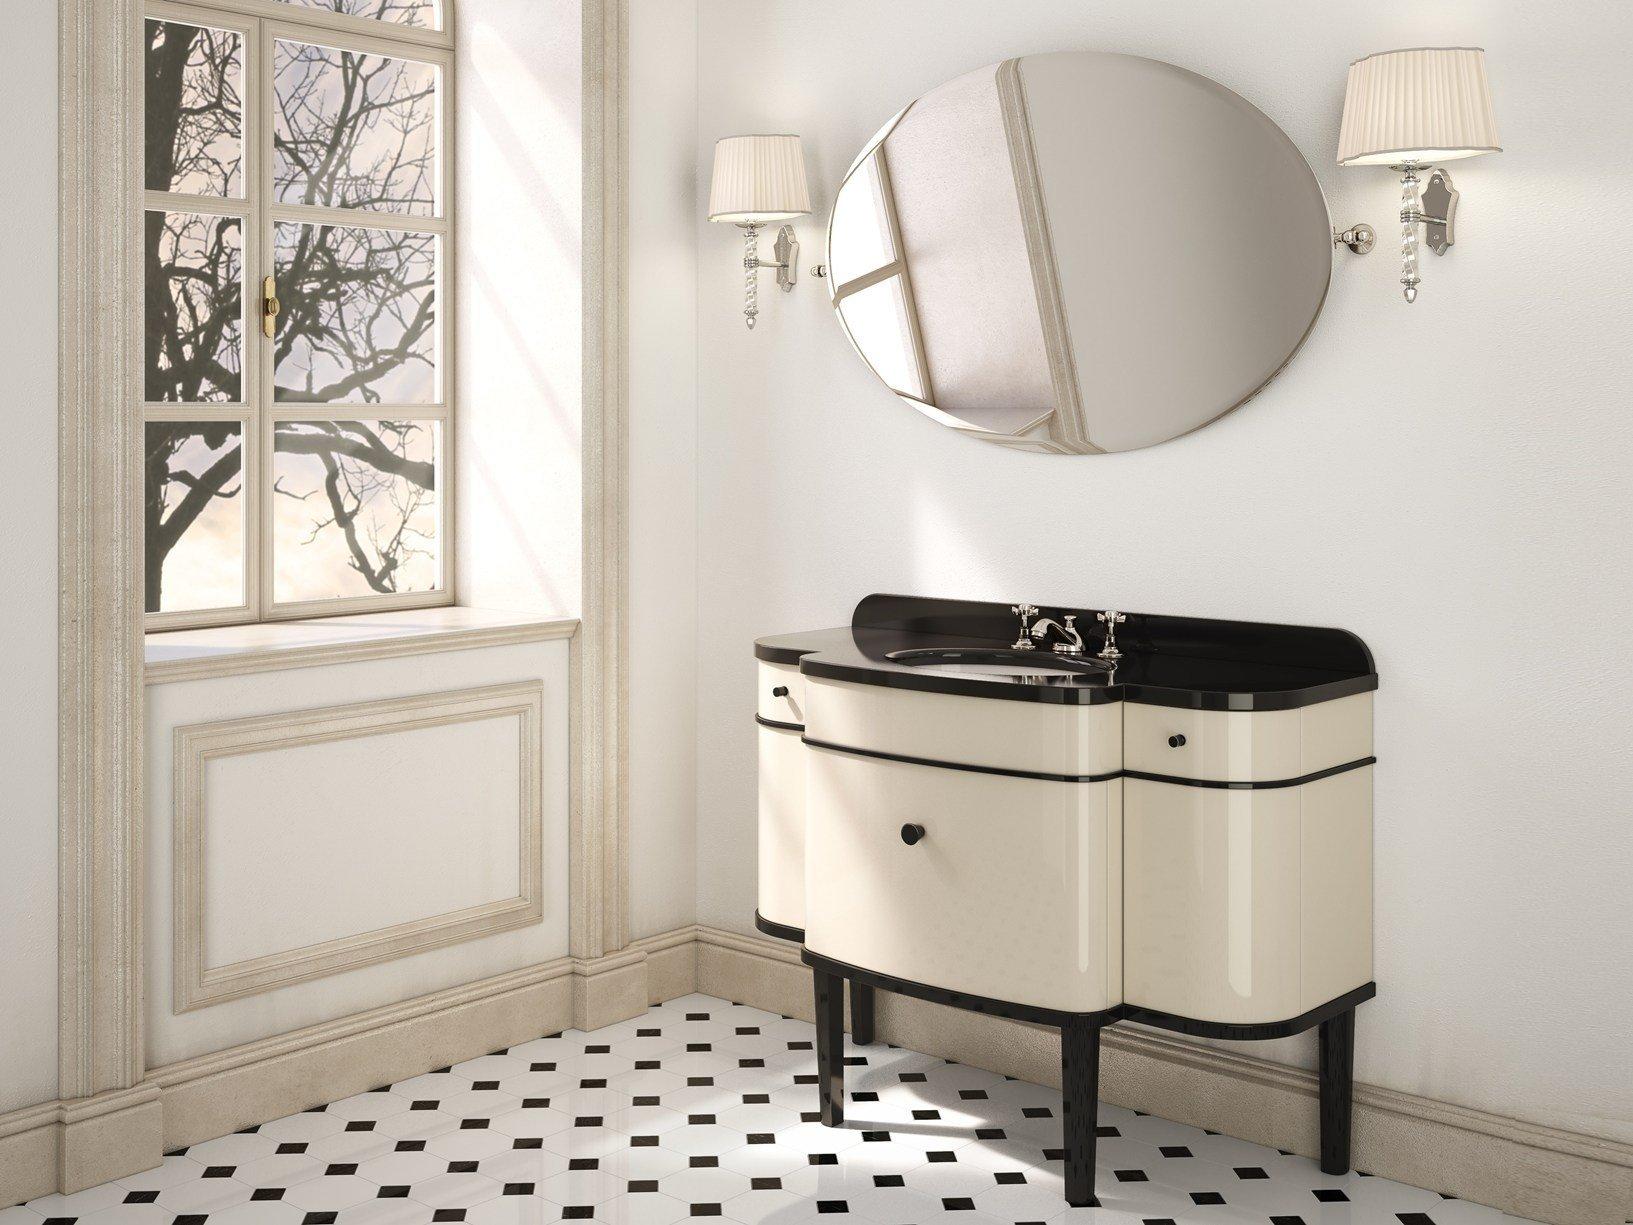 devon devon presenta music a isaloni. Black Bedroom Furniture Sets. Home Design Ideas